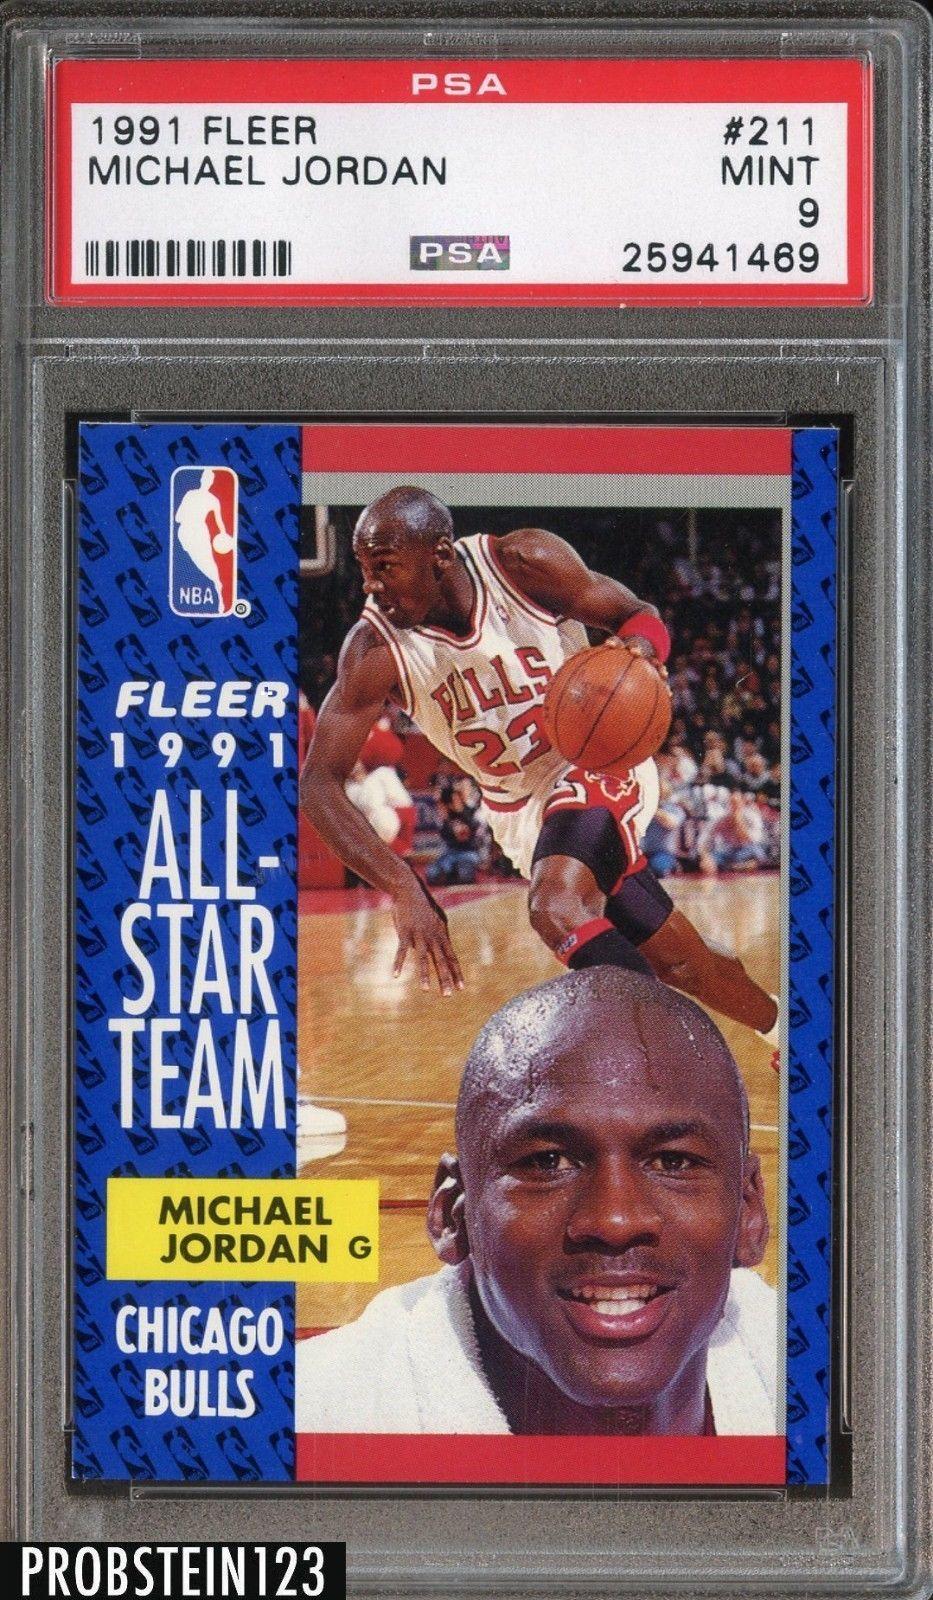 1991 fleer basketball 211 michael jordan chicago bulls